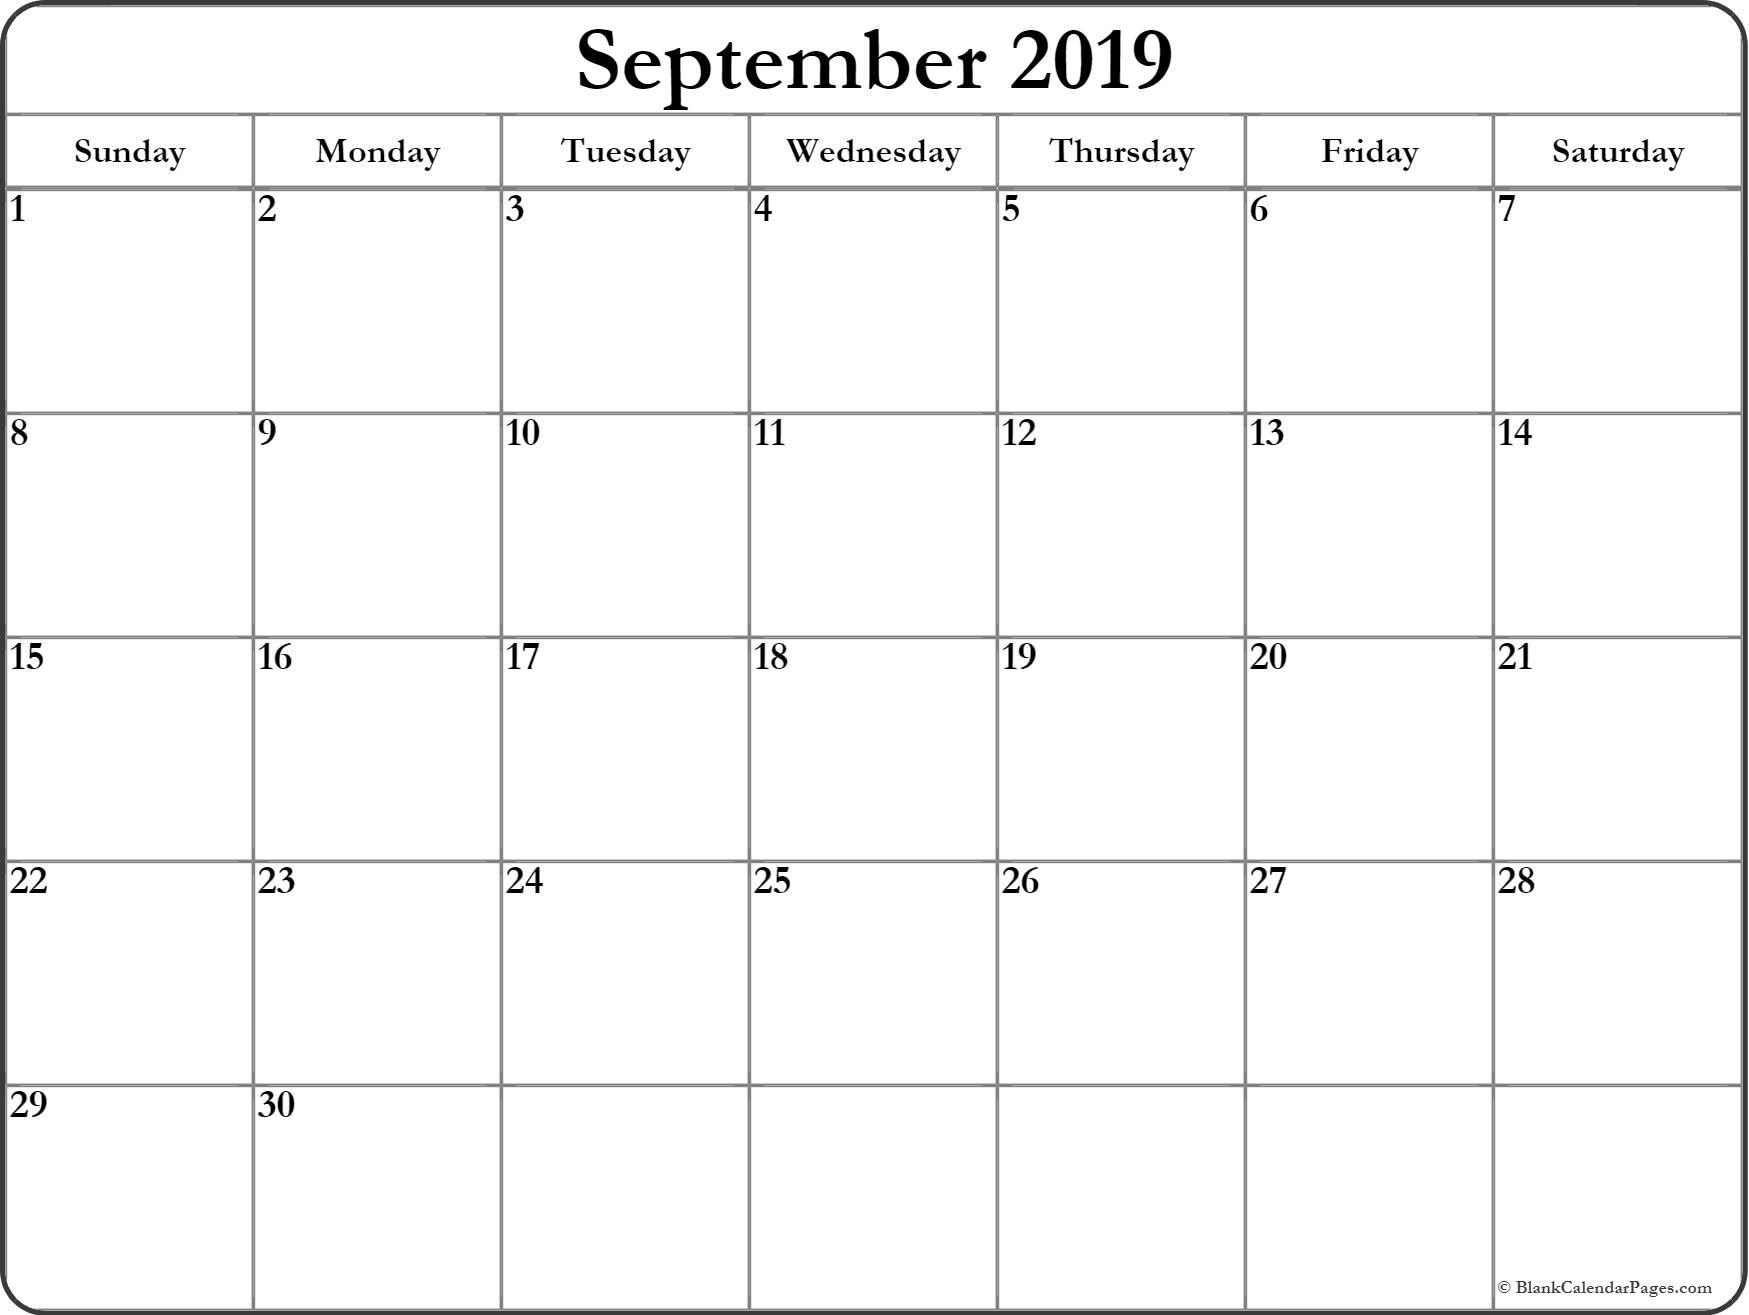 September 2019 Calendar | Free Printable Monthly Calendars intended for Blank Printable September Calendar Template